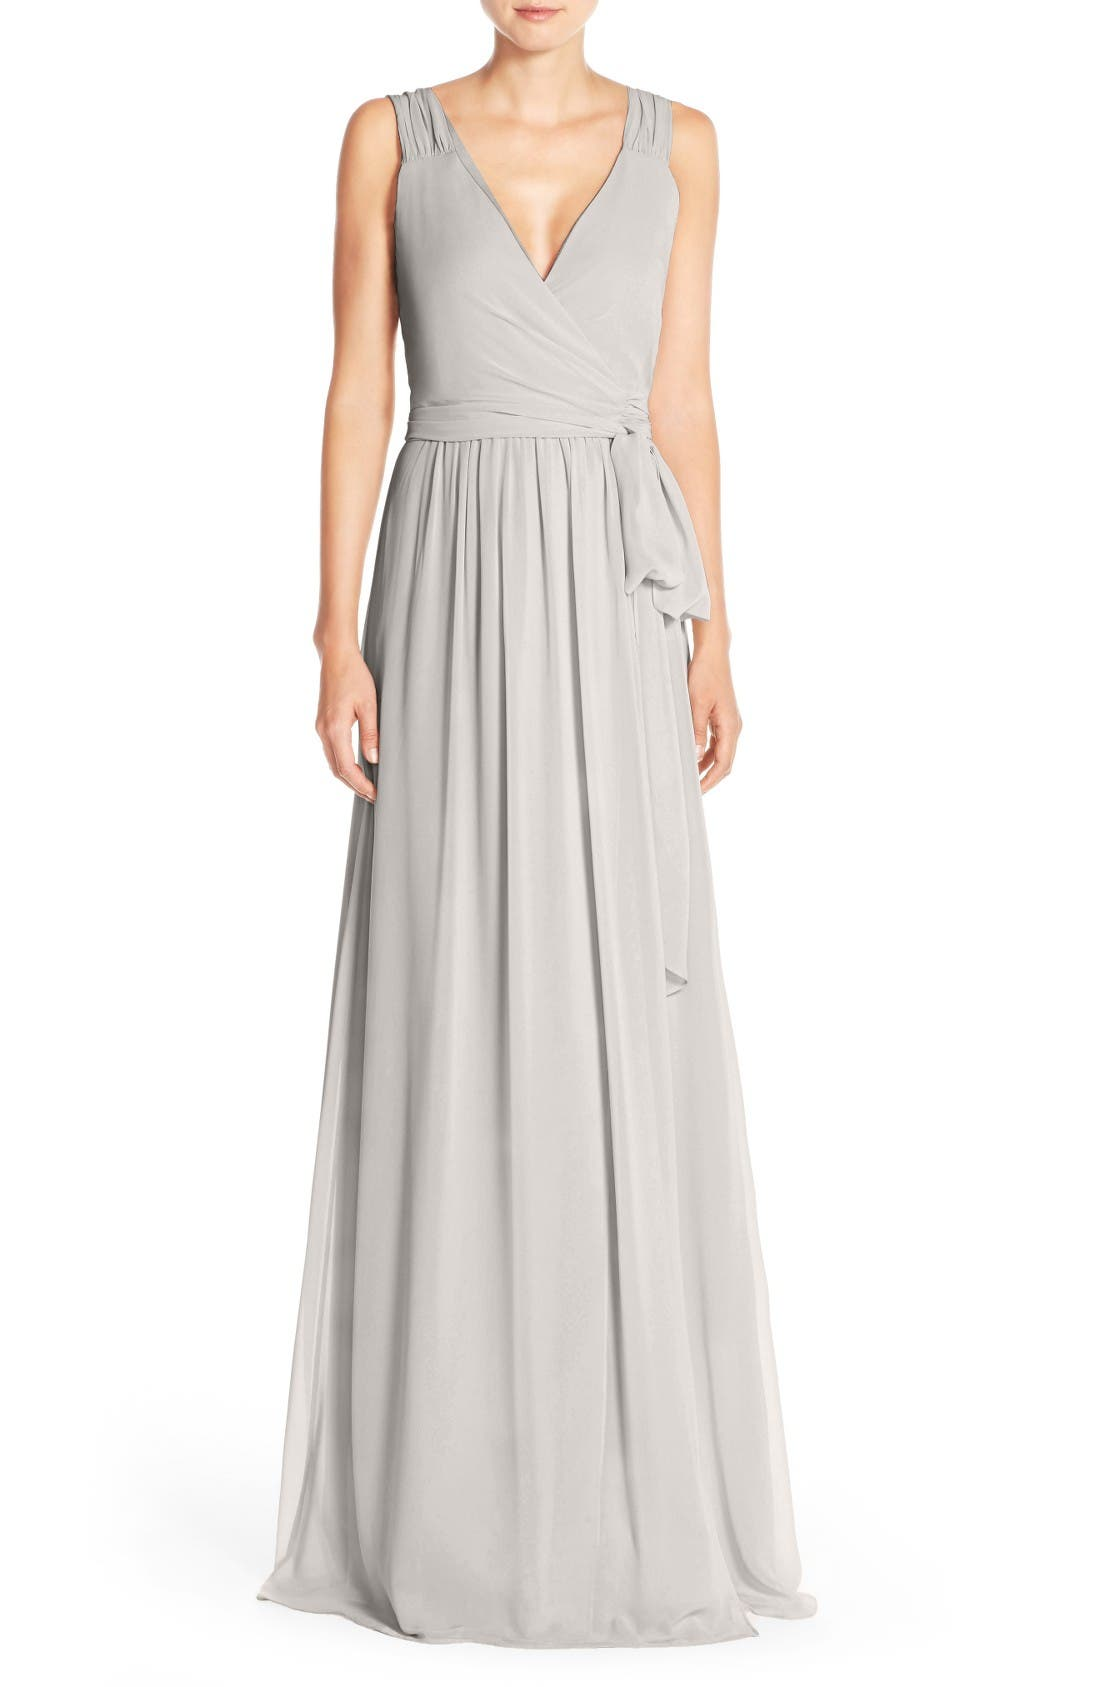 Newbury Gathered Sleeve Chiffon Wrap Gown,                             Main thumbnail 1, color,                             022